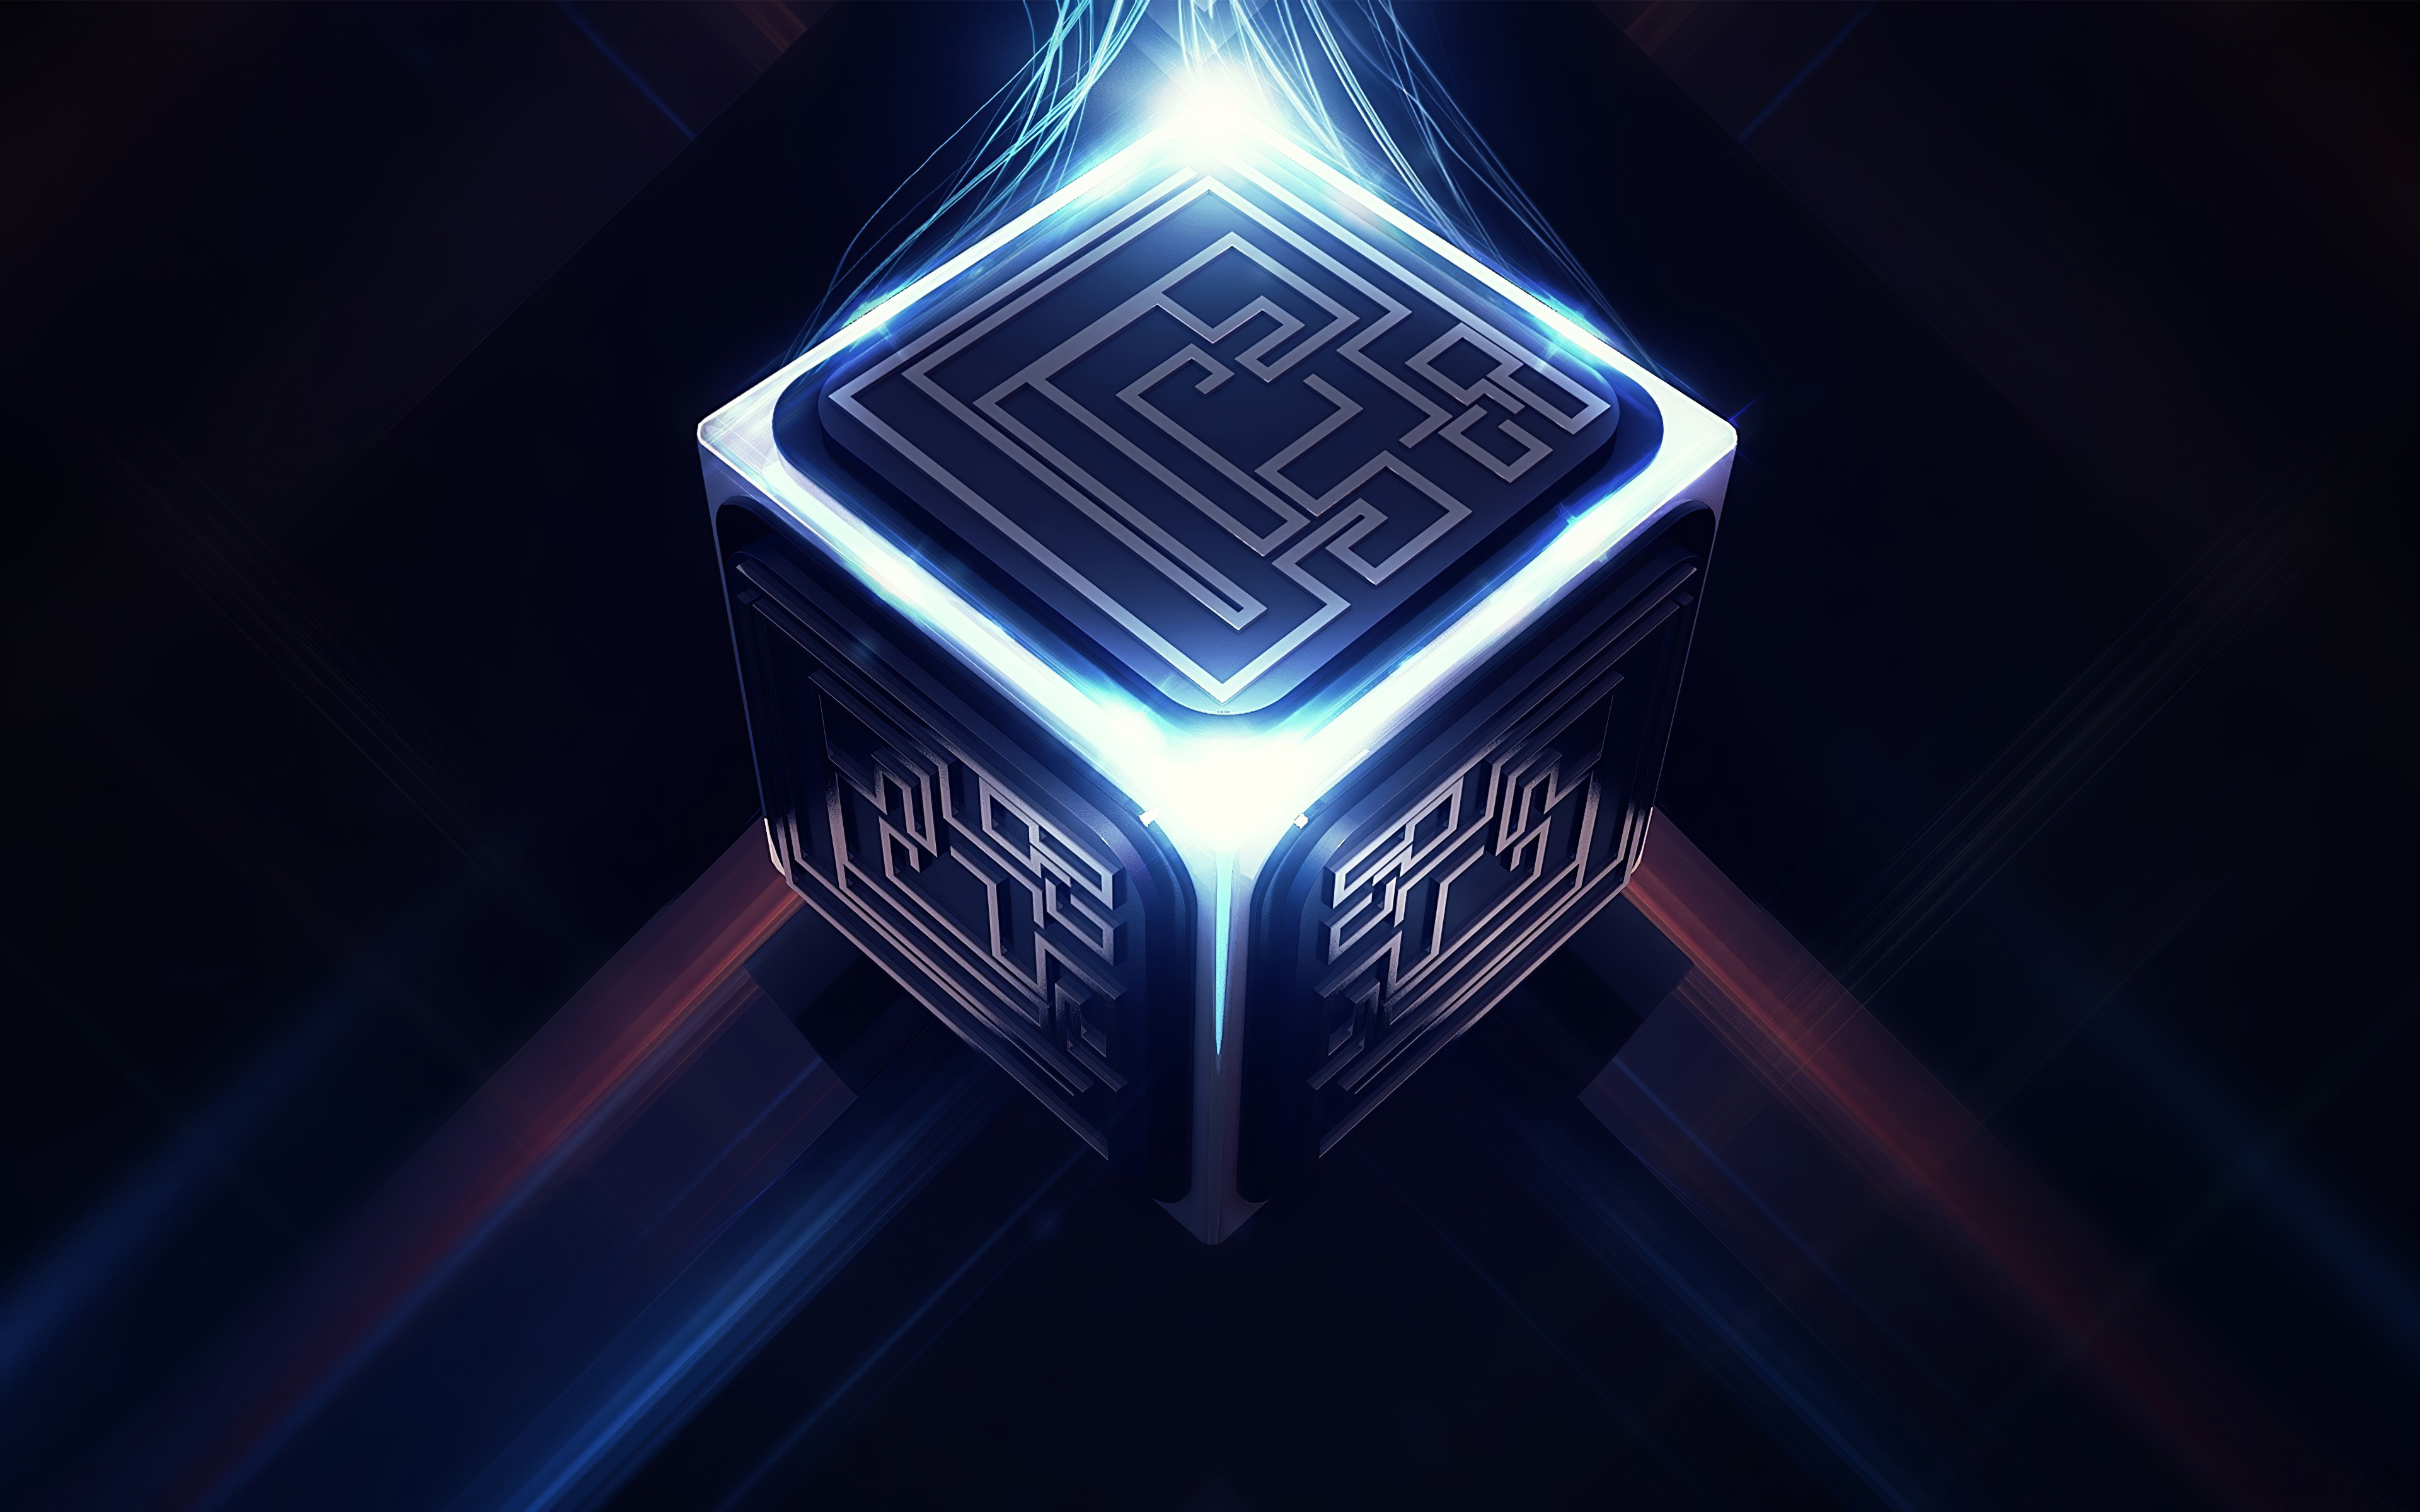 cube energy 1580590034 - Cube Energy - Cube Energy wallpapers, Cube Energy 4k wallpapers